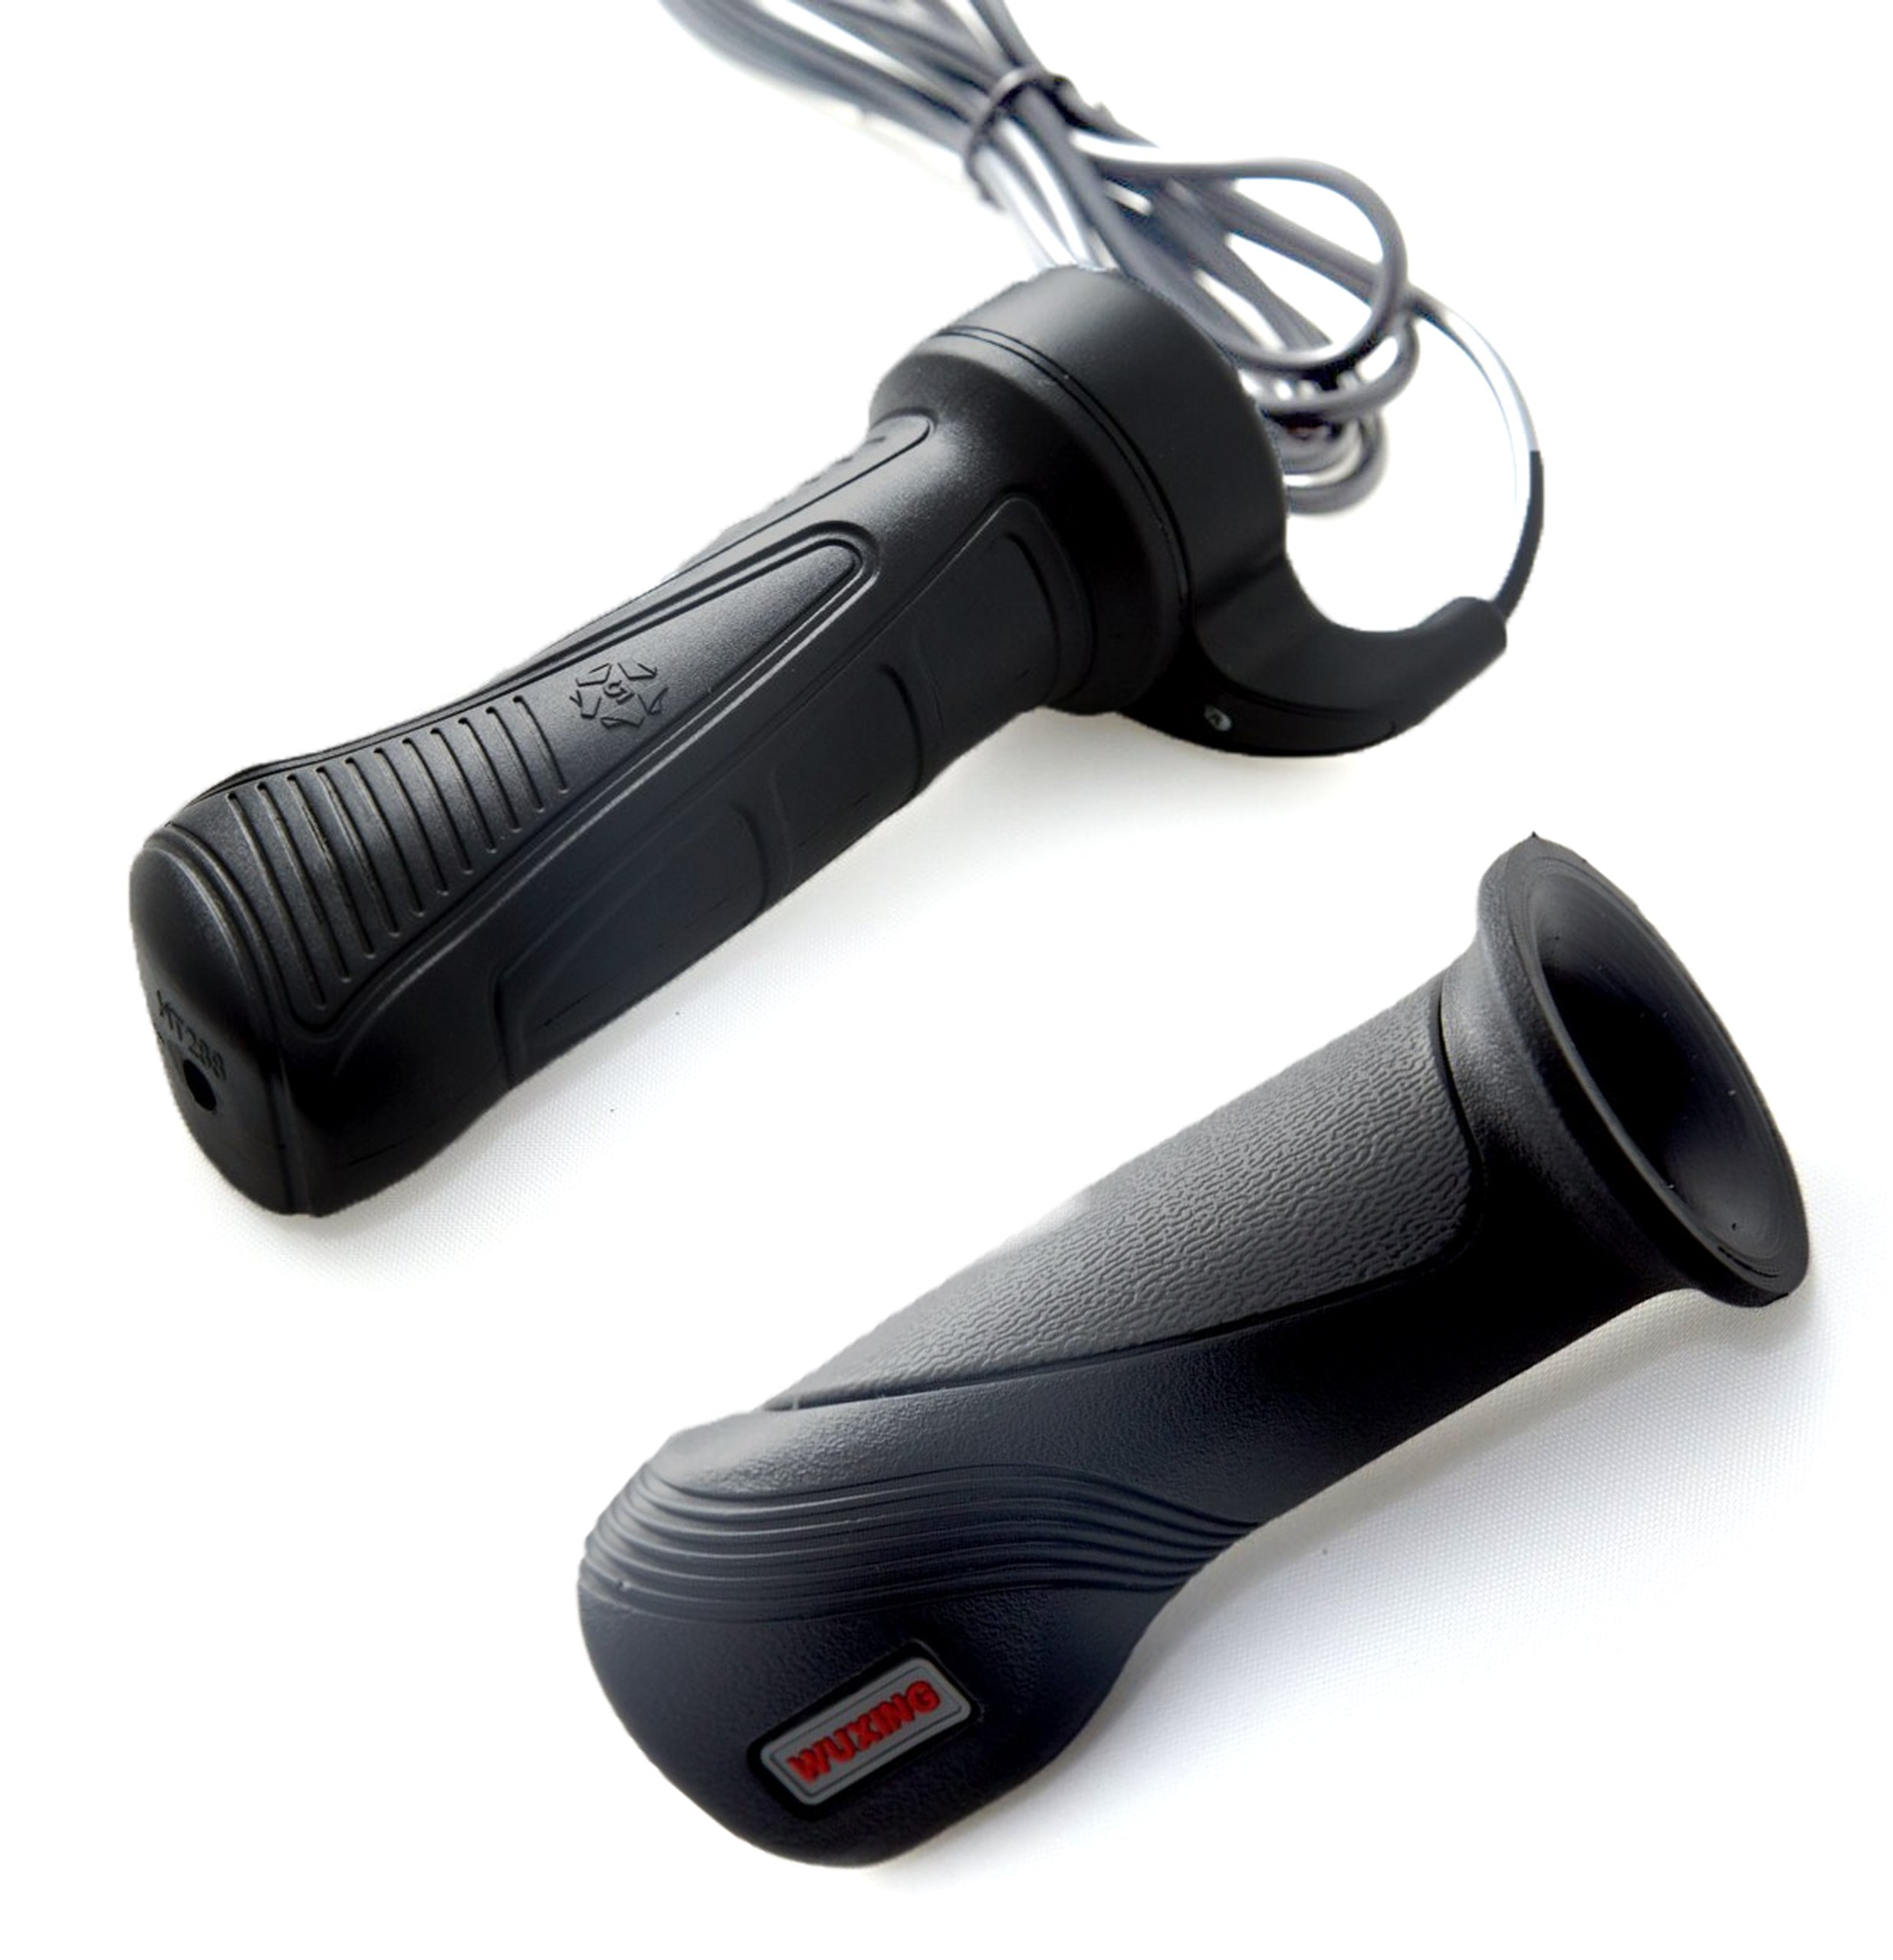 Electric Scooter Pocket Bike E-Bike Speed Control Throttle Grip